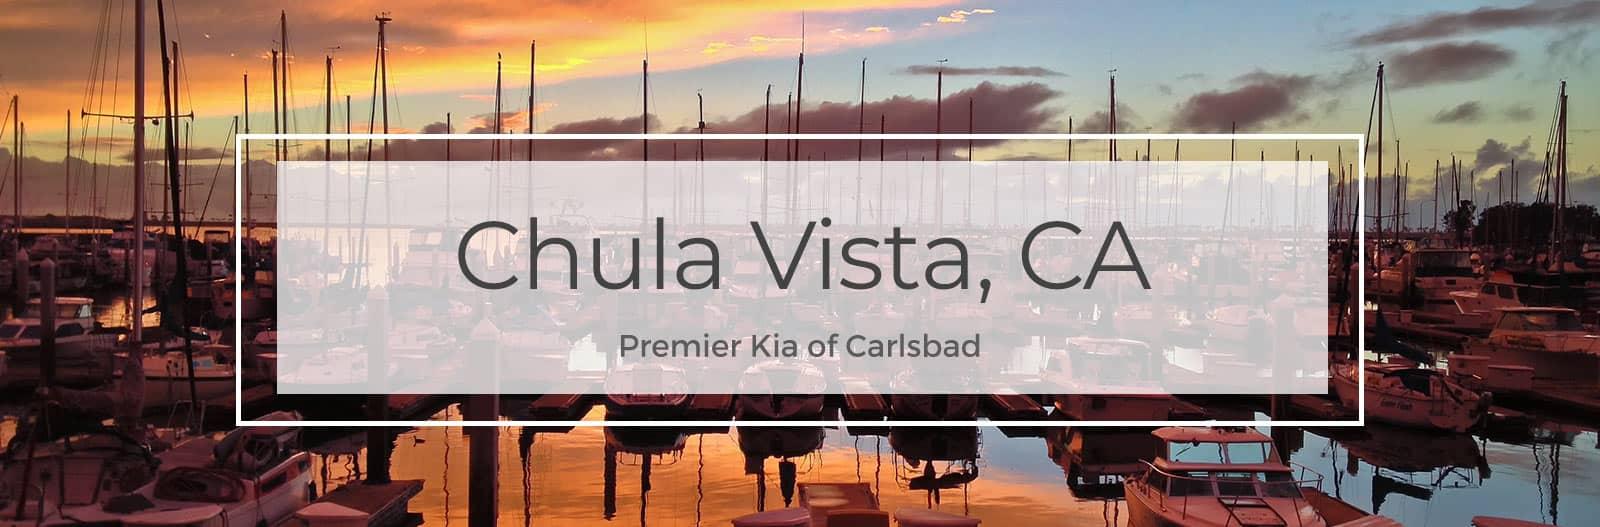 Premier KIA Carlsbad Serving Chula Vista, CA